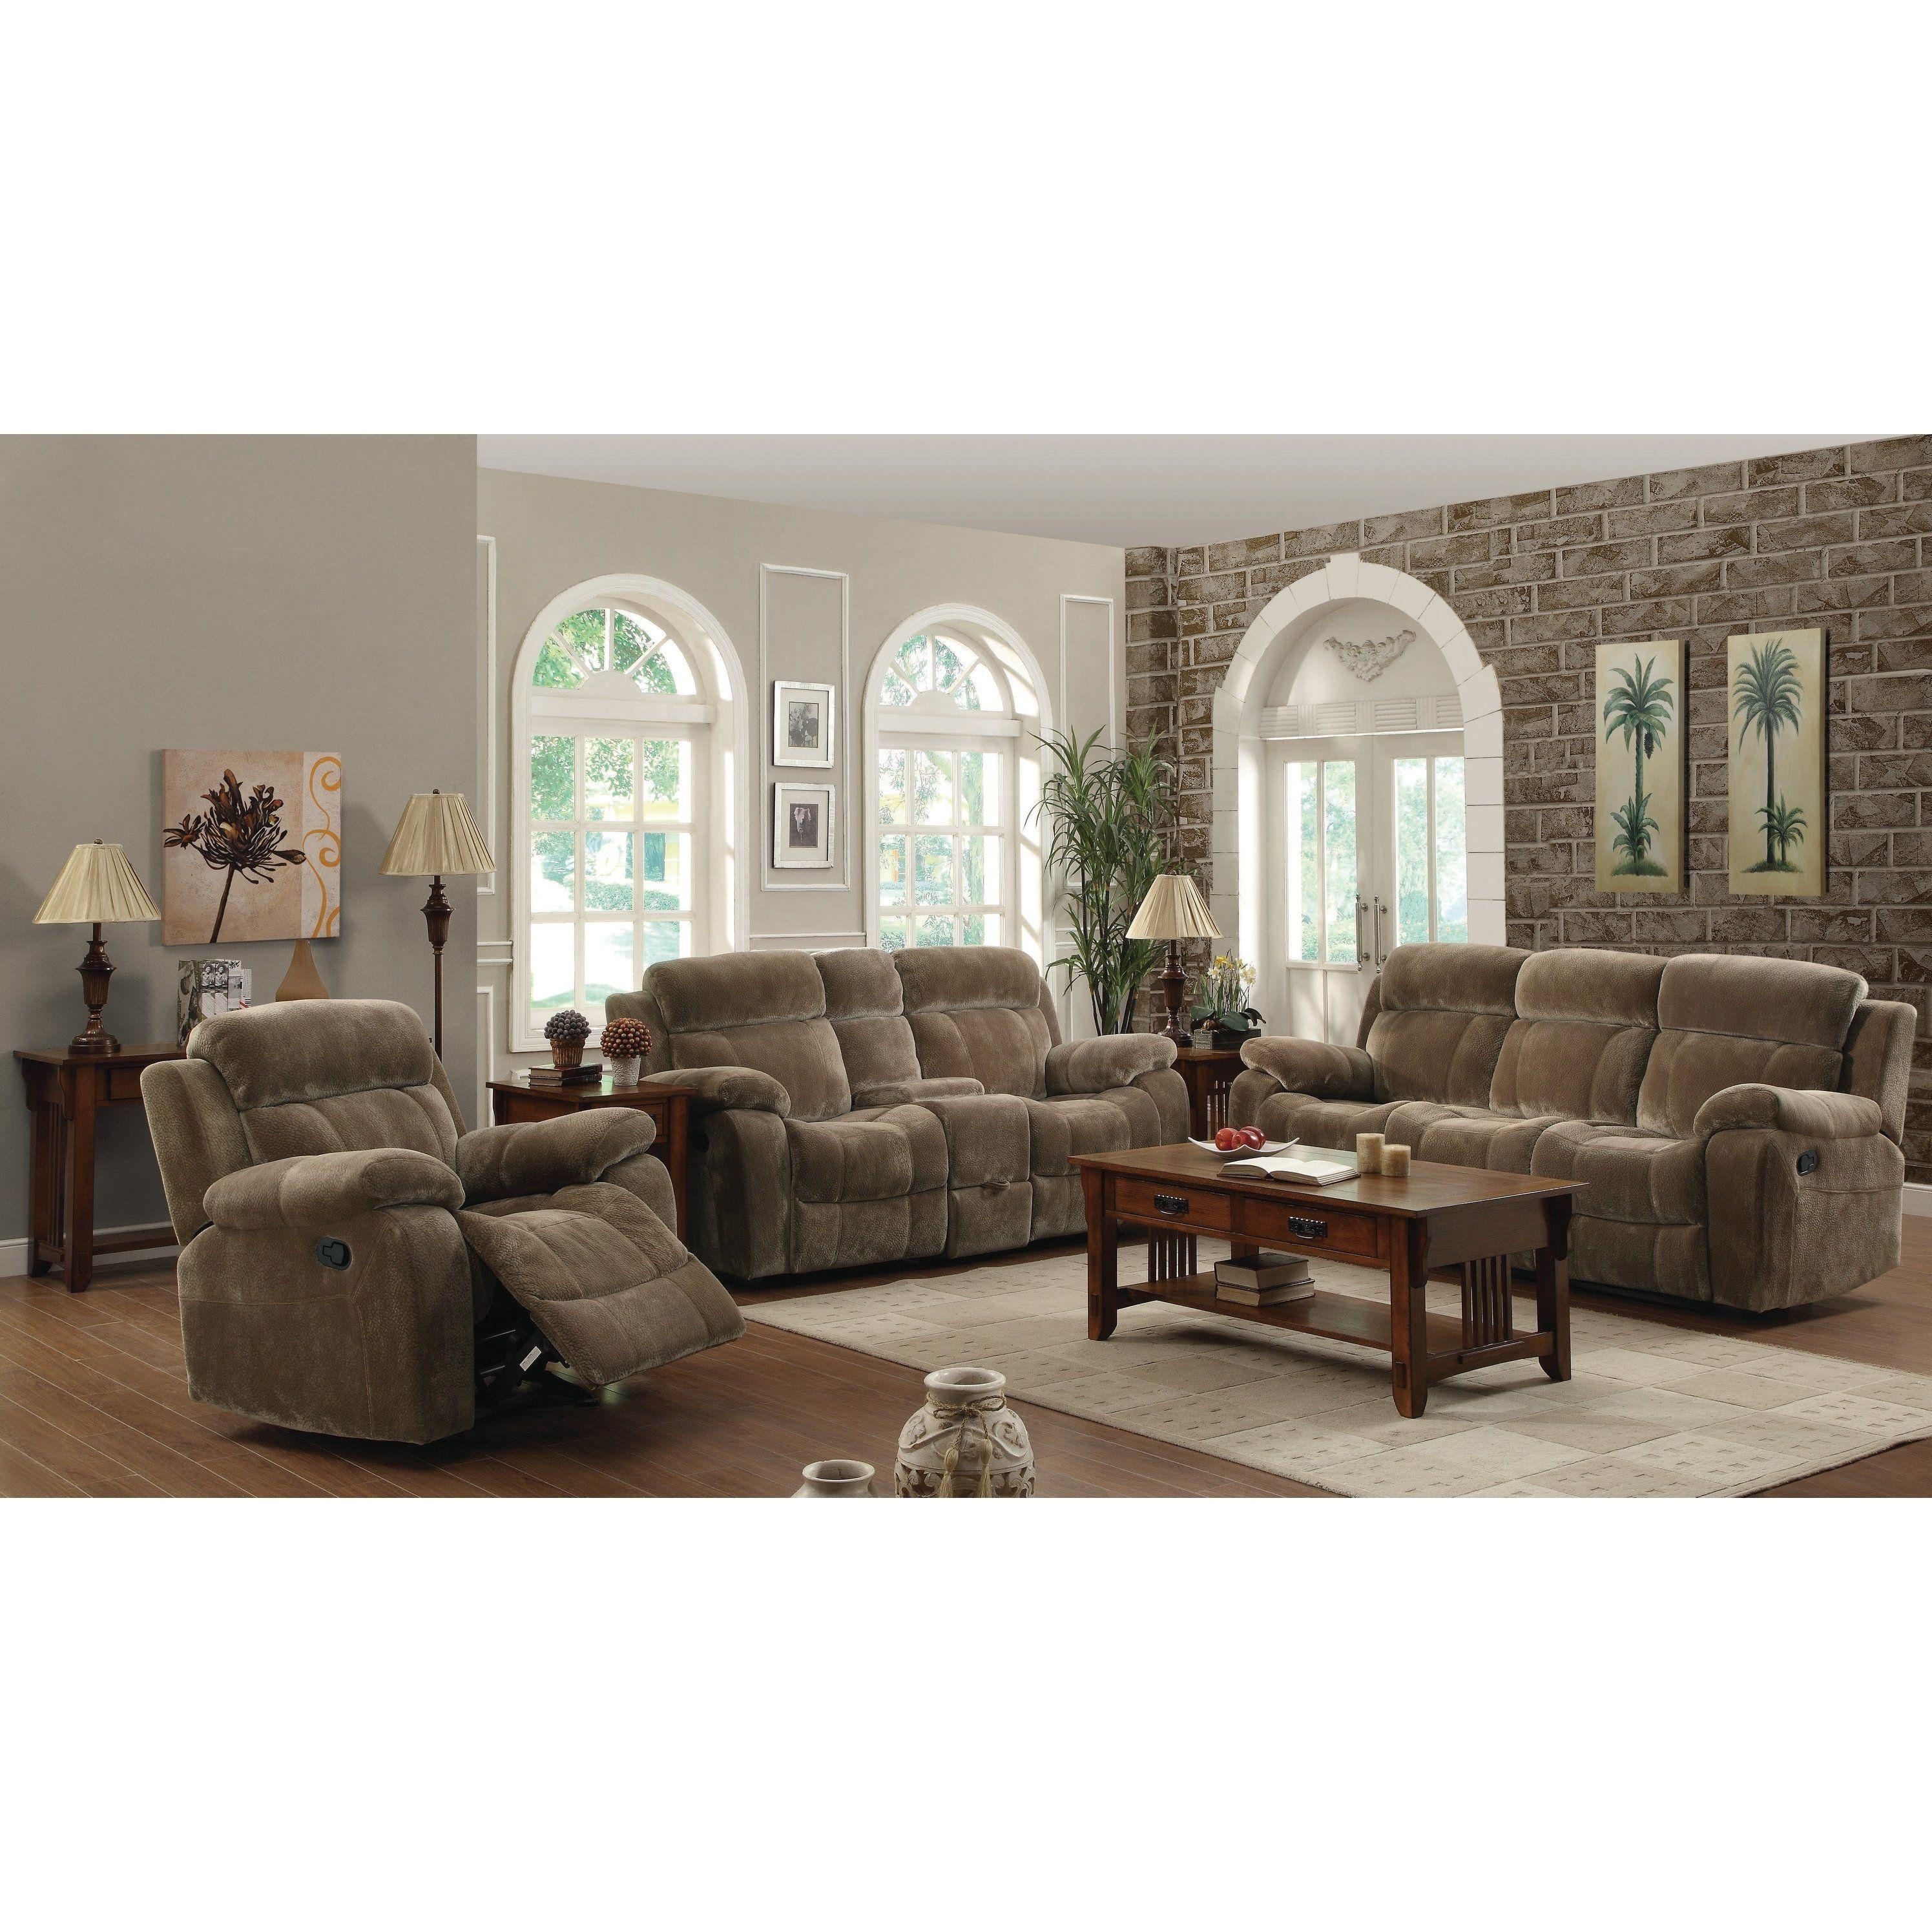 10+ Most Popular Reclining 3 Piece Living Room Set